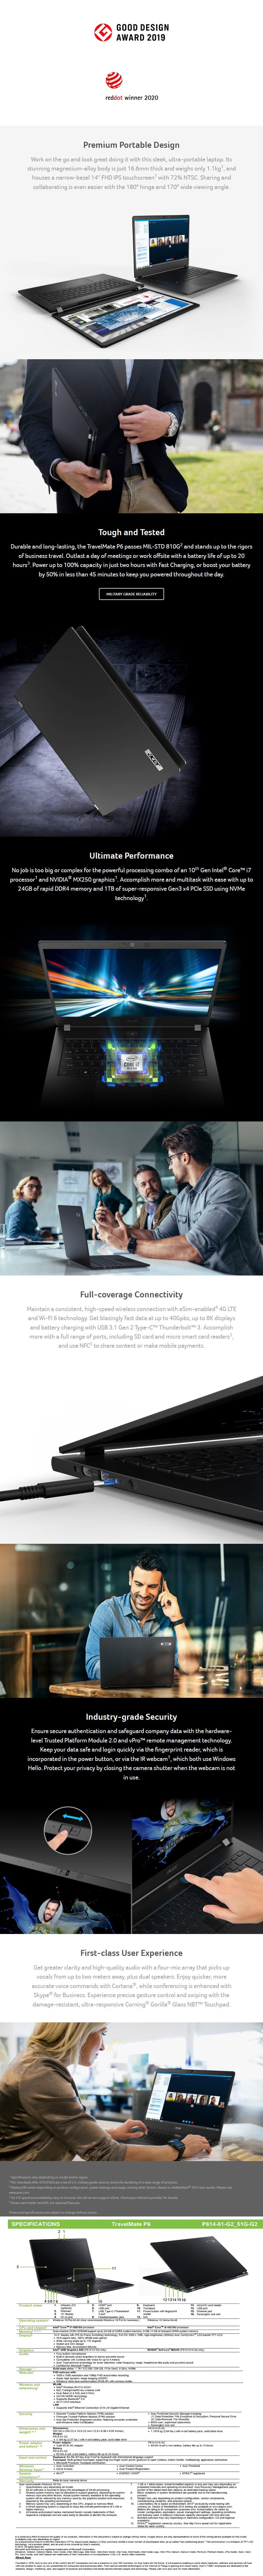 acer-travelmate-p614-14-laptop-i510210u-16gb-256gb-win10-pro-touch-ac41269-10.jpg